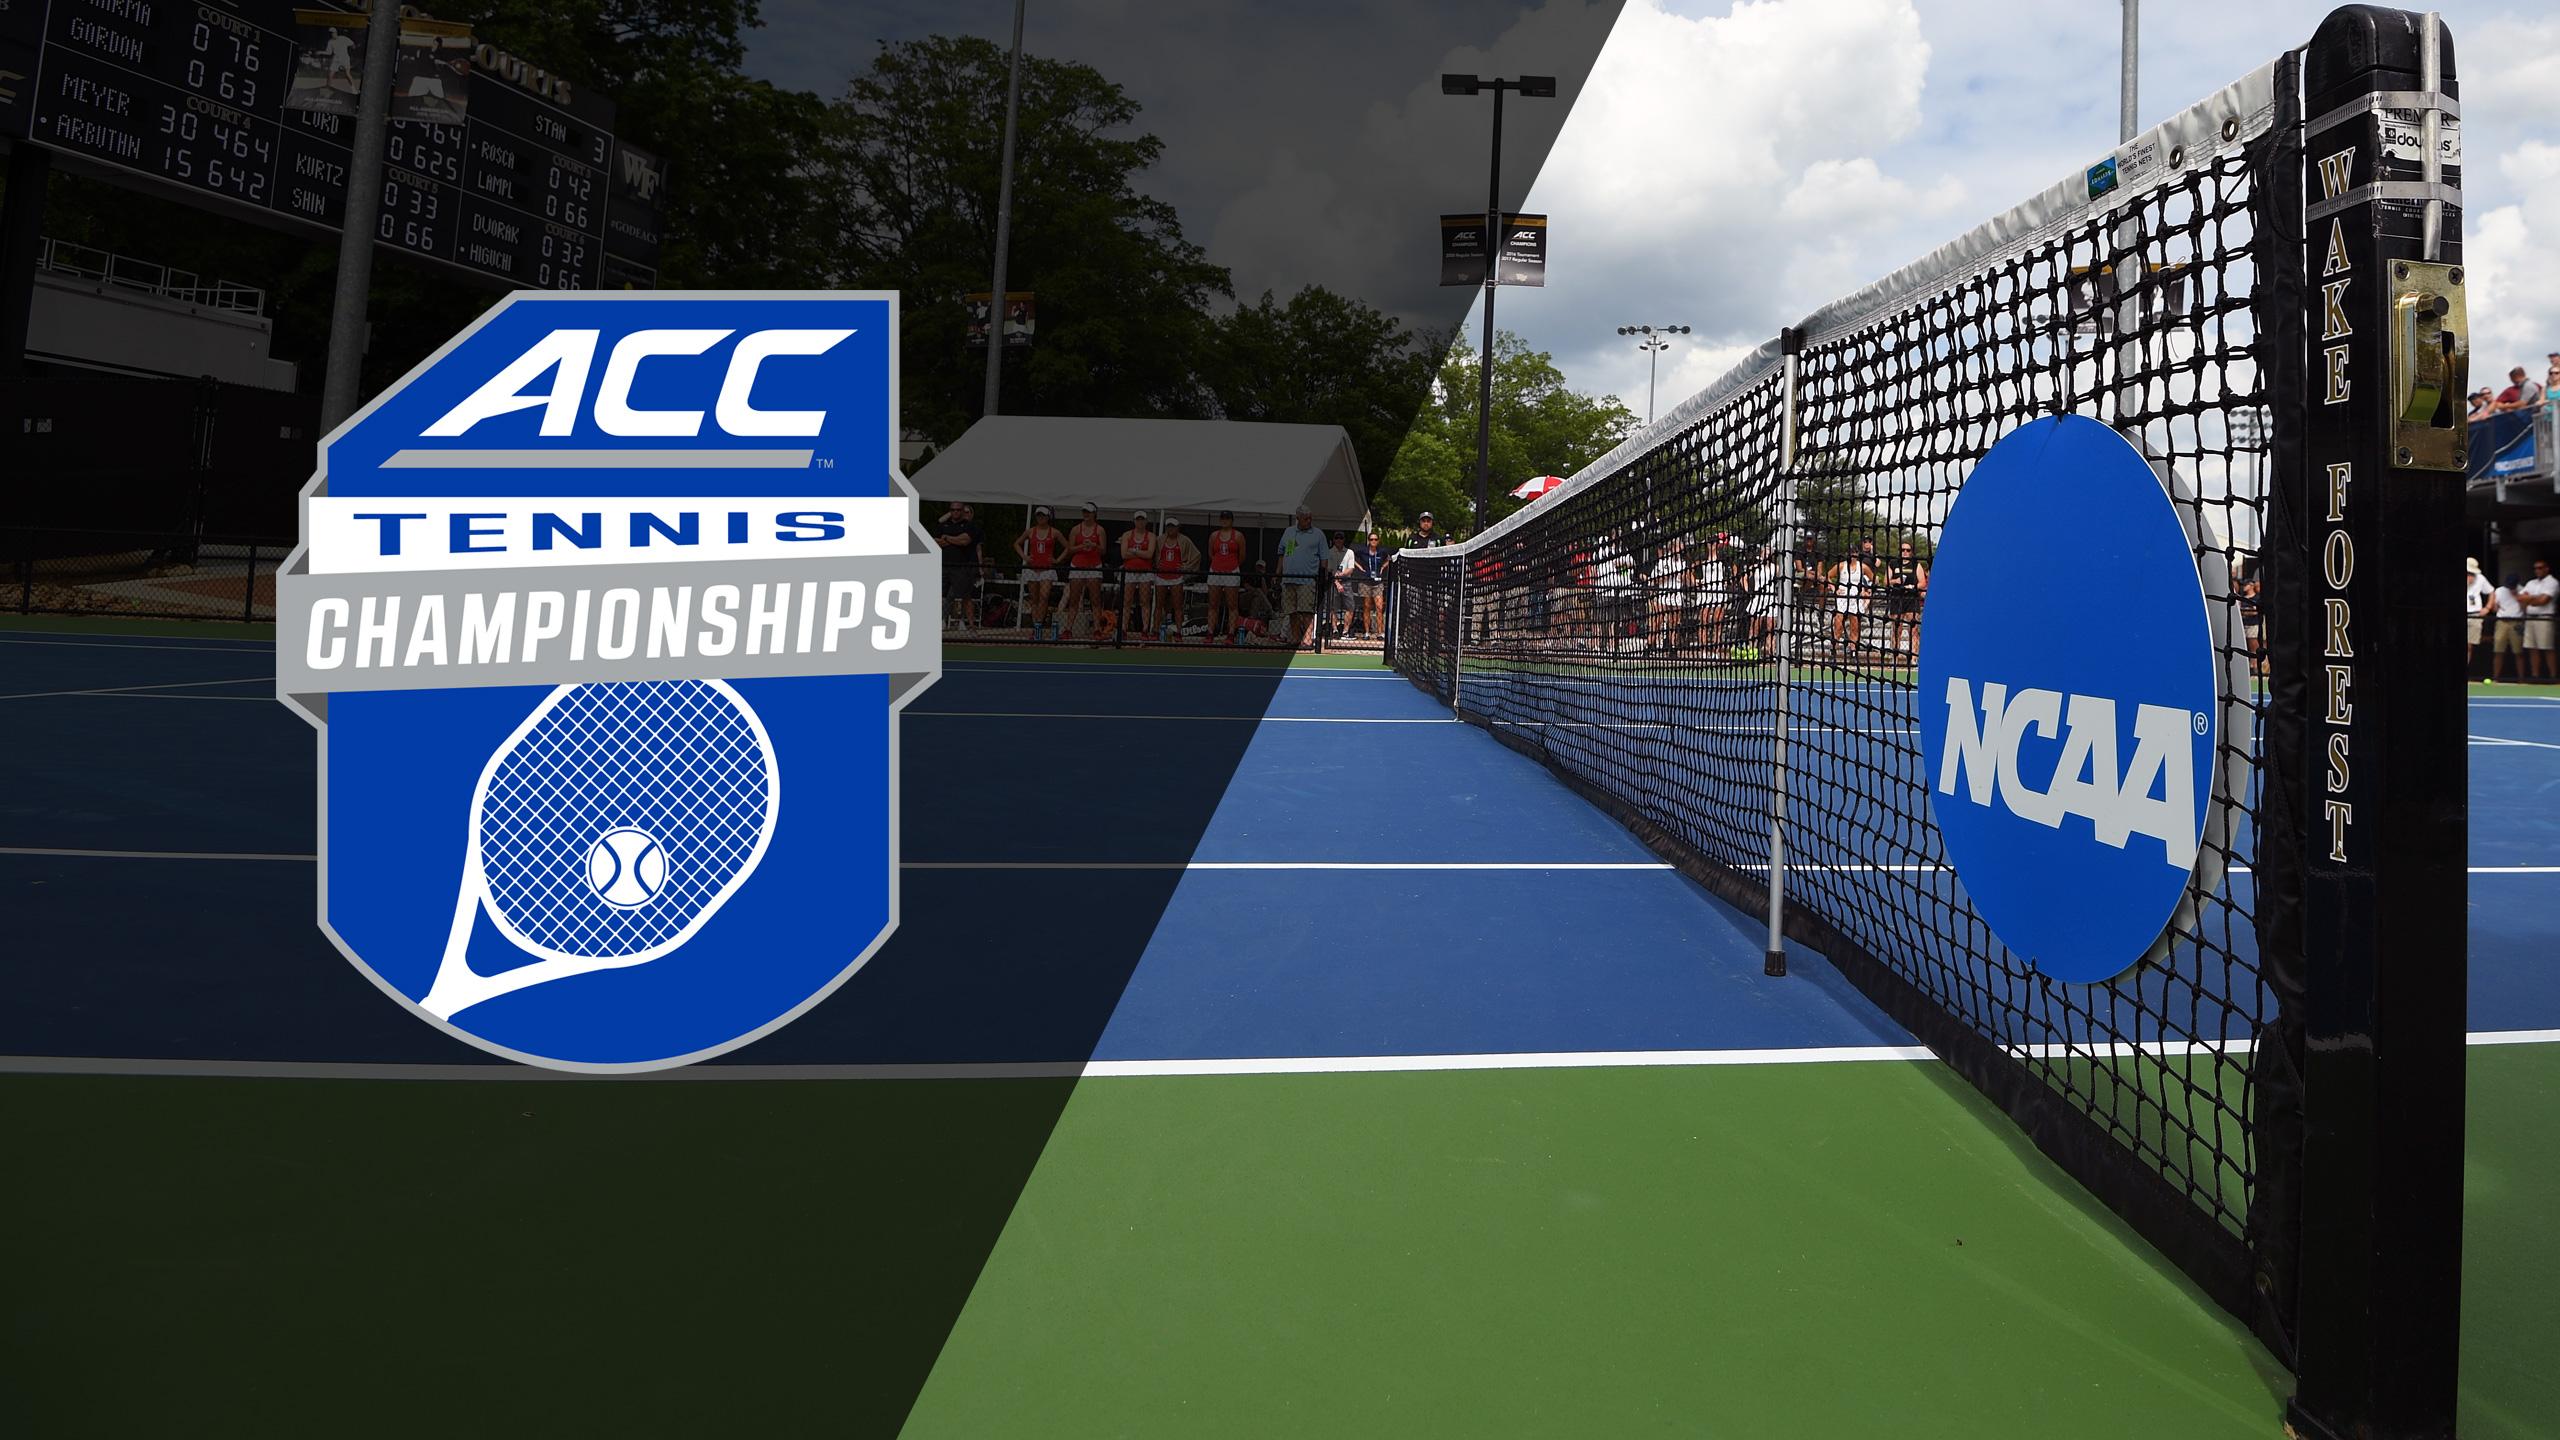 ACC Men's Tennis Championship (Men's Final)